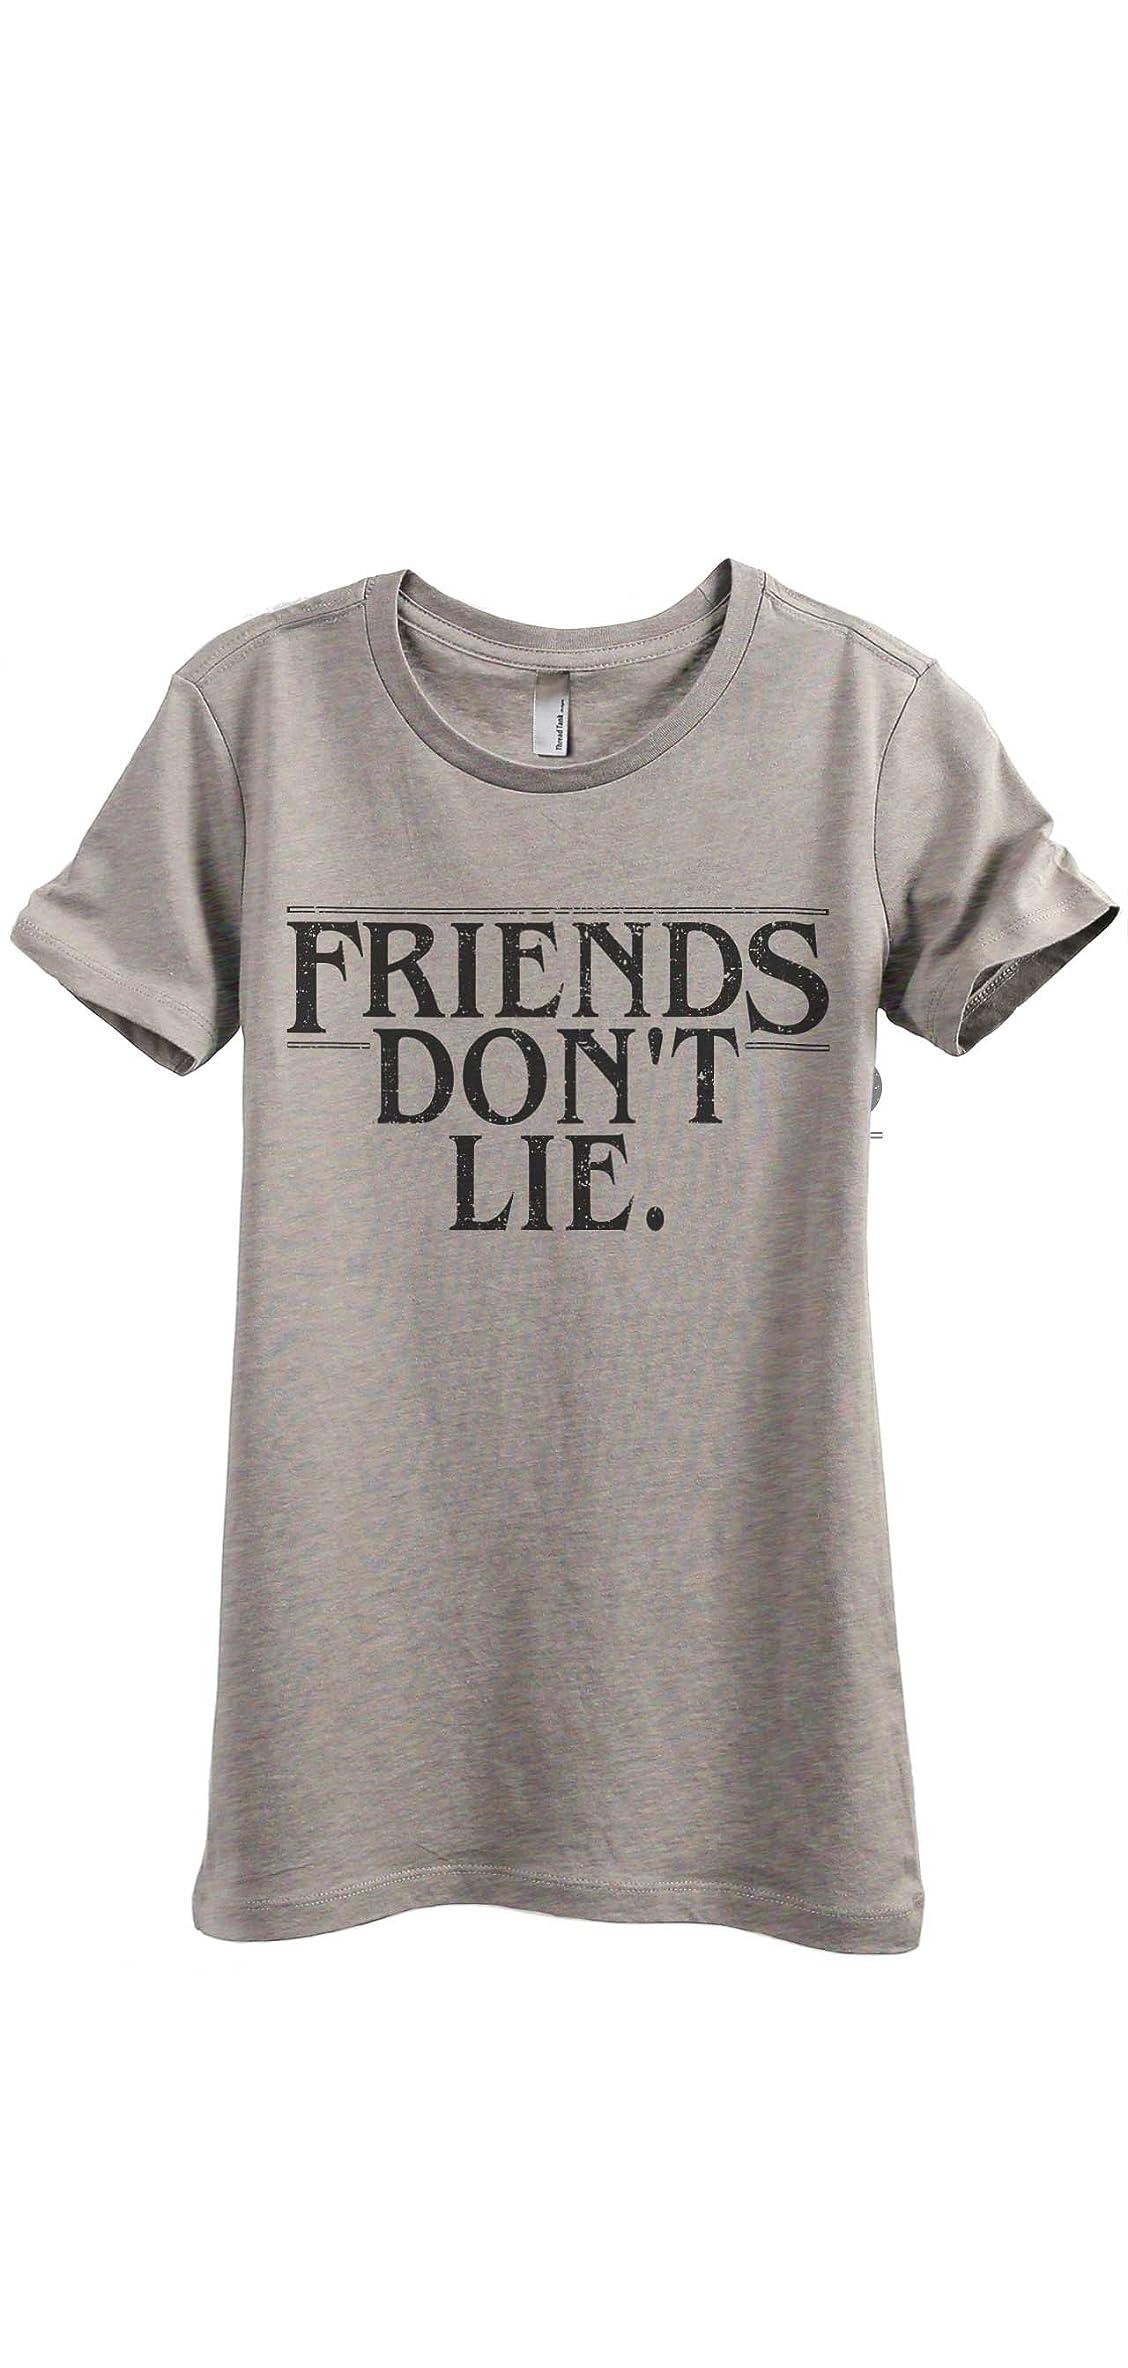 Friends Don't Lie Women's Fashion Relaxed T-shirt